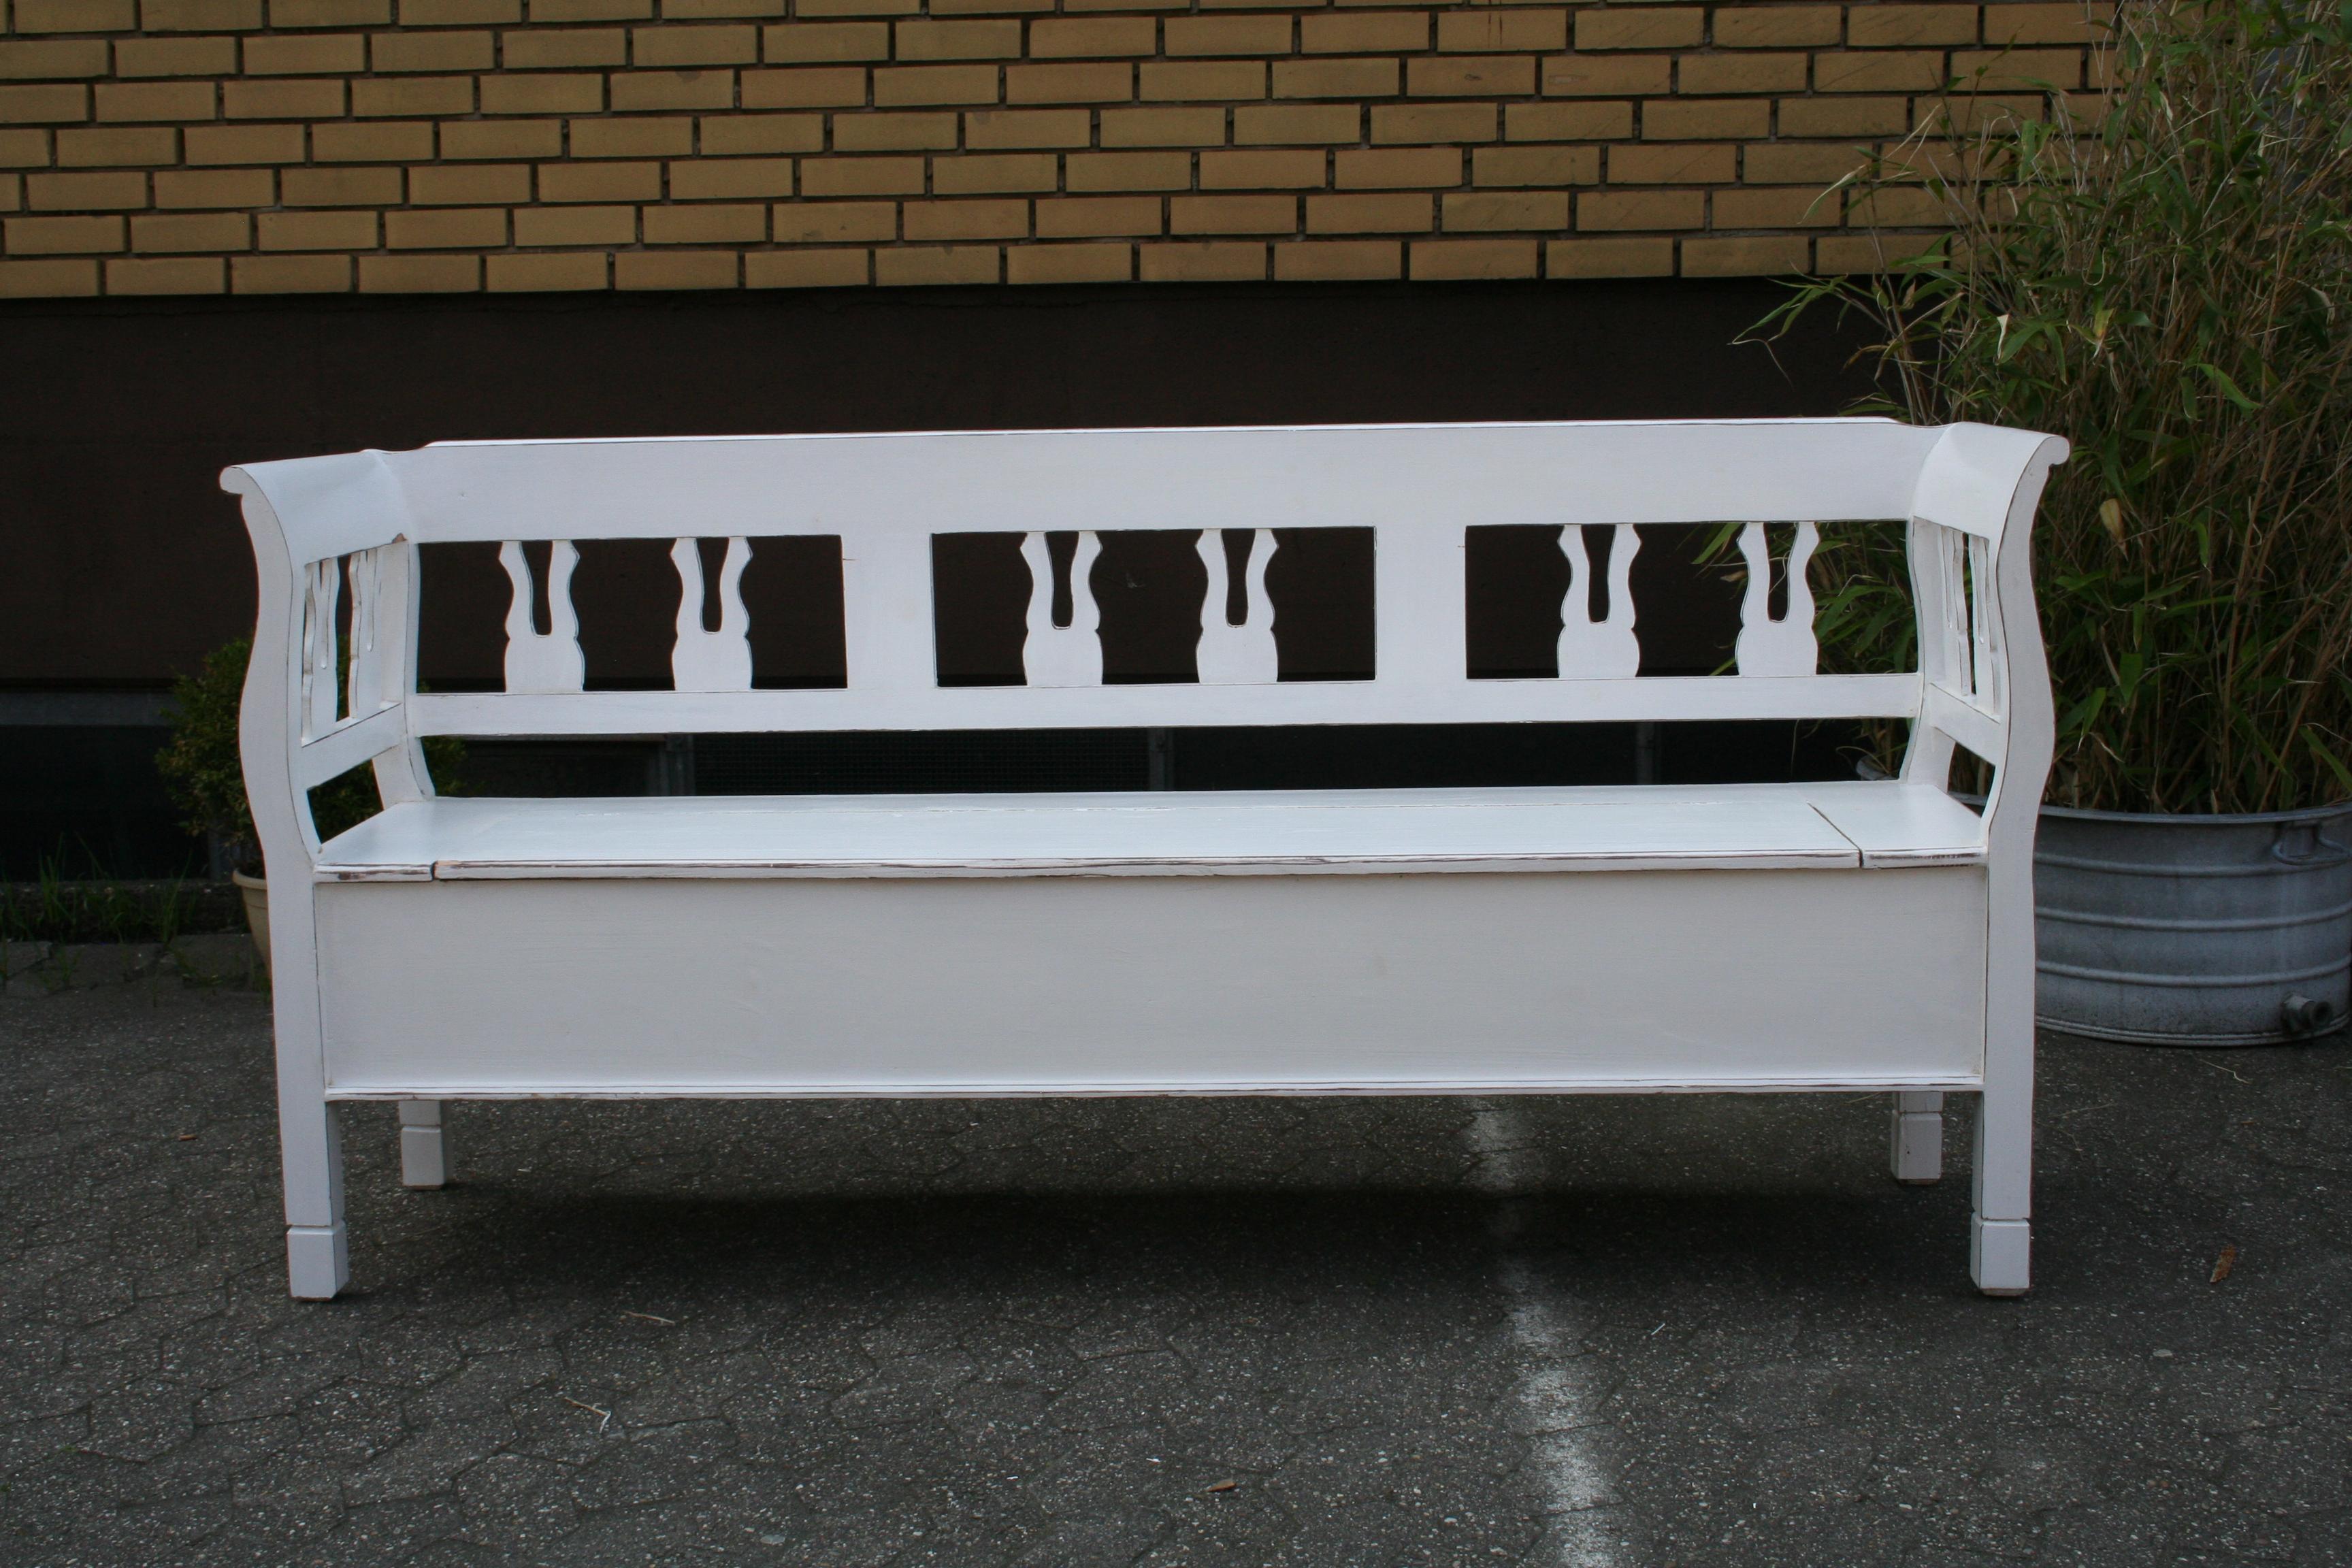 weichholz bank truhenbank sitzbank gartenbank shabby chic landhausm bel wei e bank. Black Bedroom Furniture Sets. Home Design Ideas